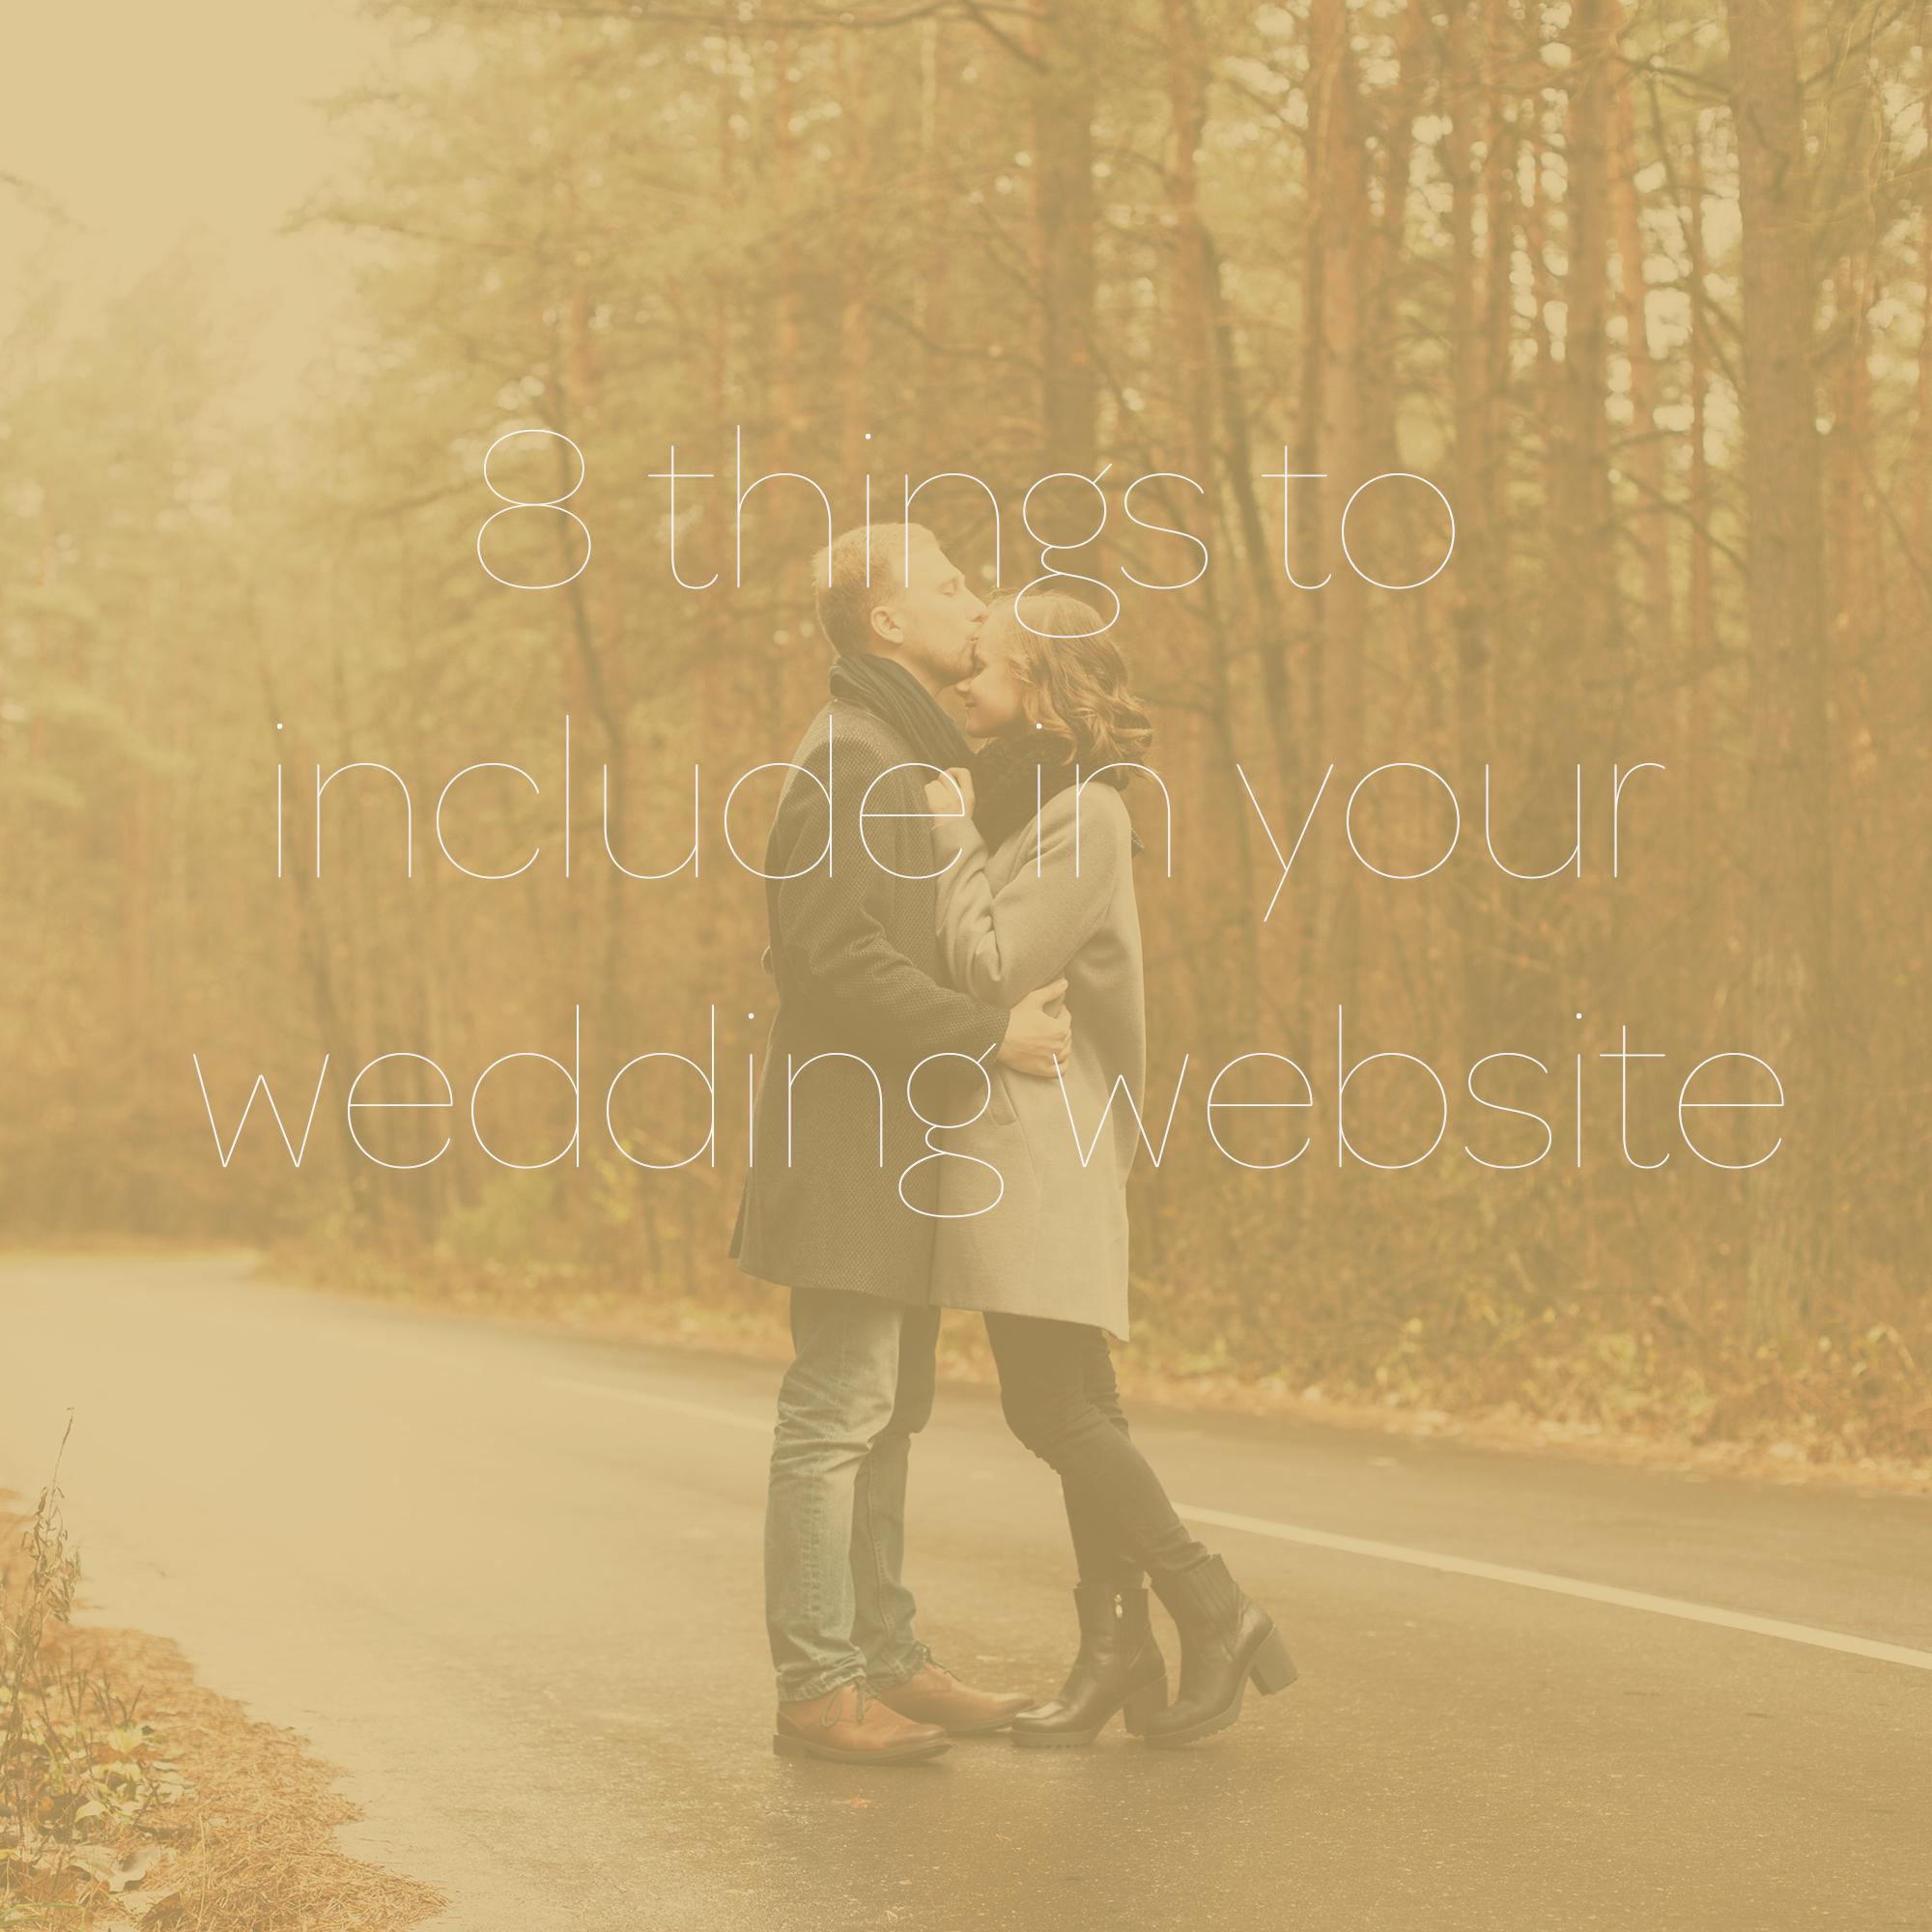 Weddingwebsite